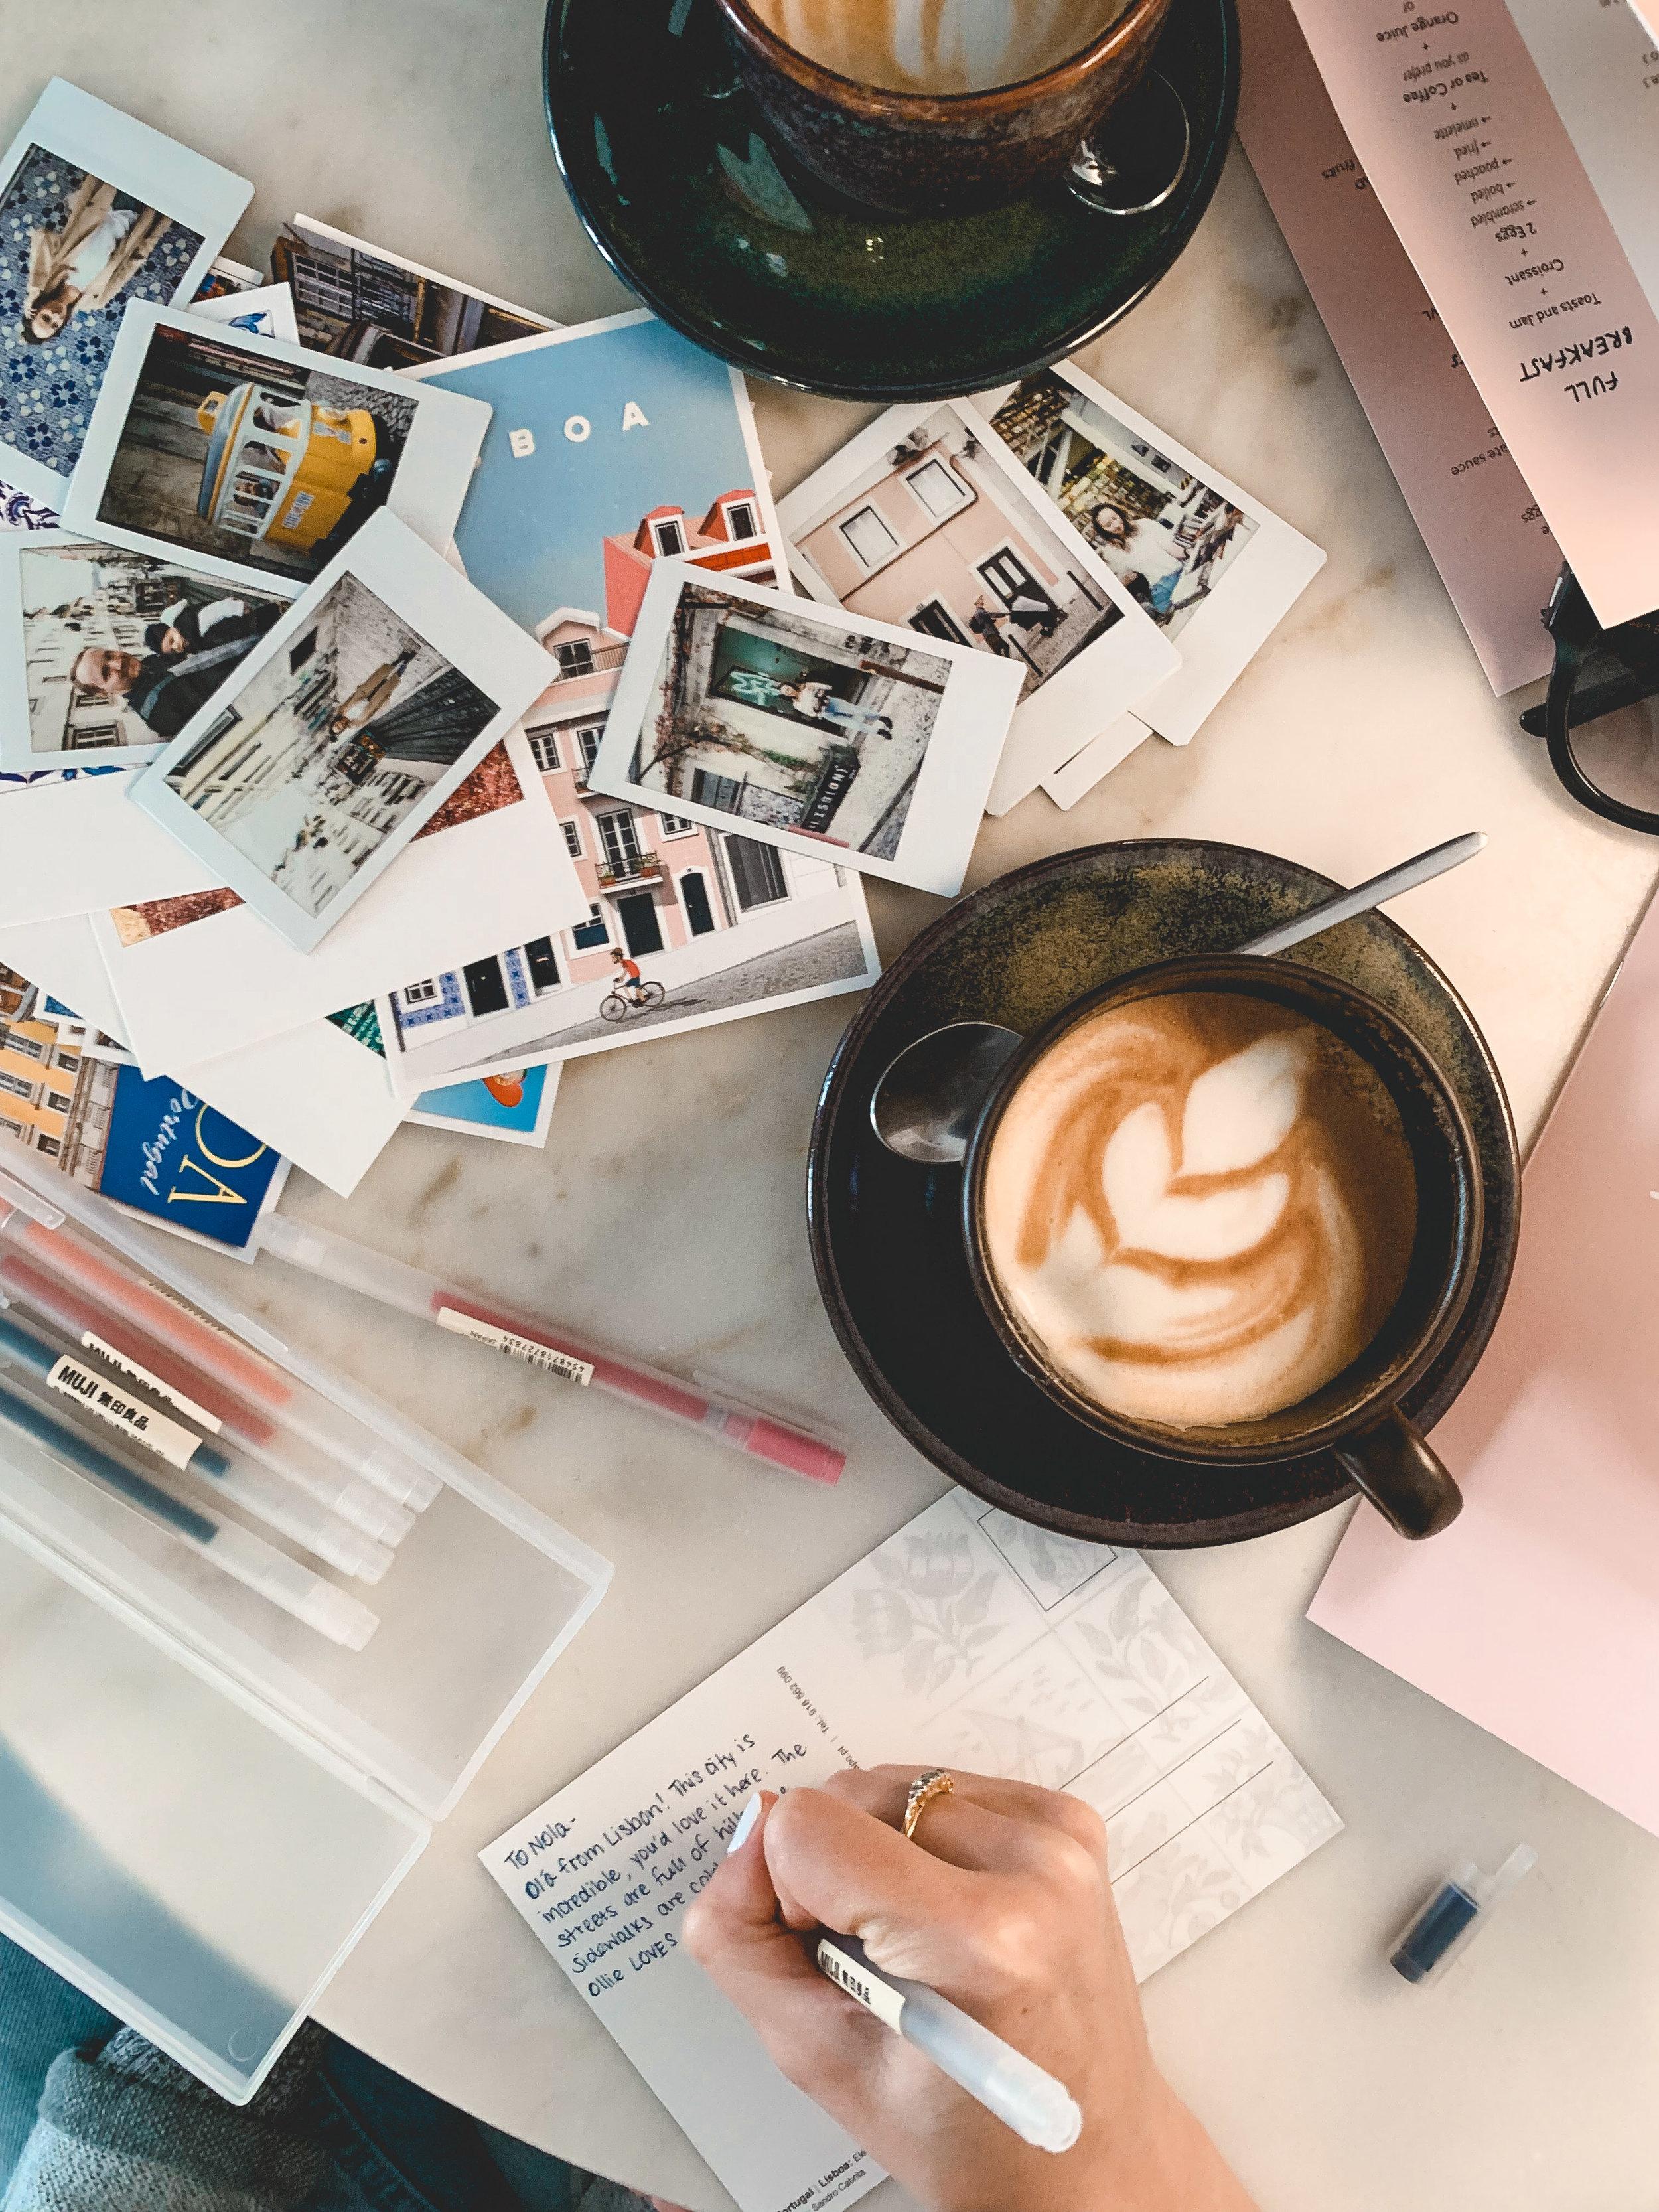 Dear Breakfast, writing our postcards